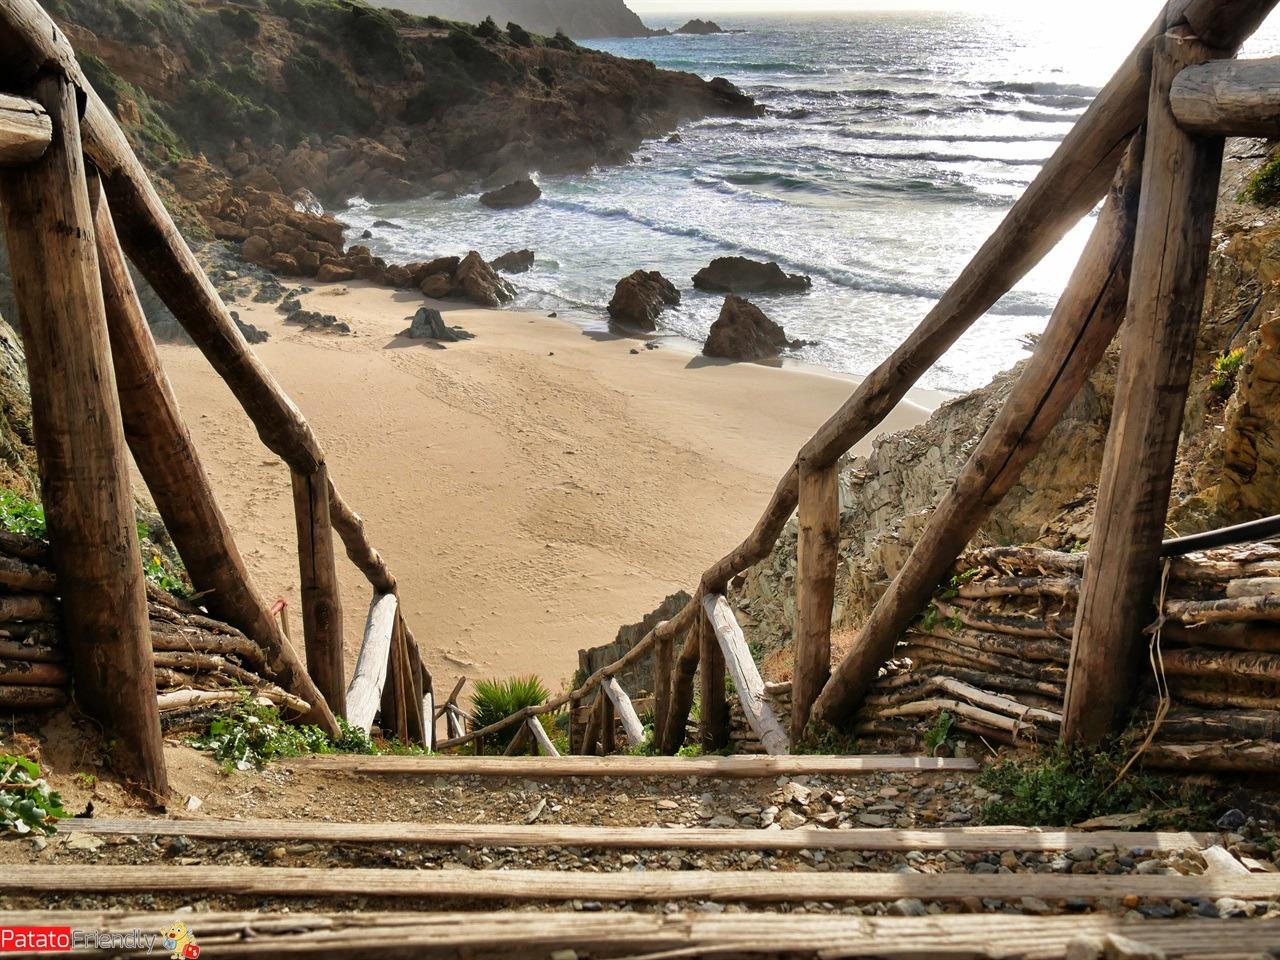 [cml_media_alt id='16439']Le bellissime spiagge selvagge del Sulcis[/cml_media_alt]